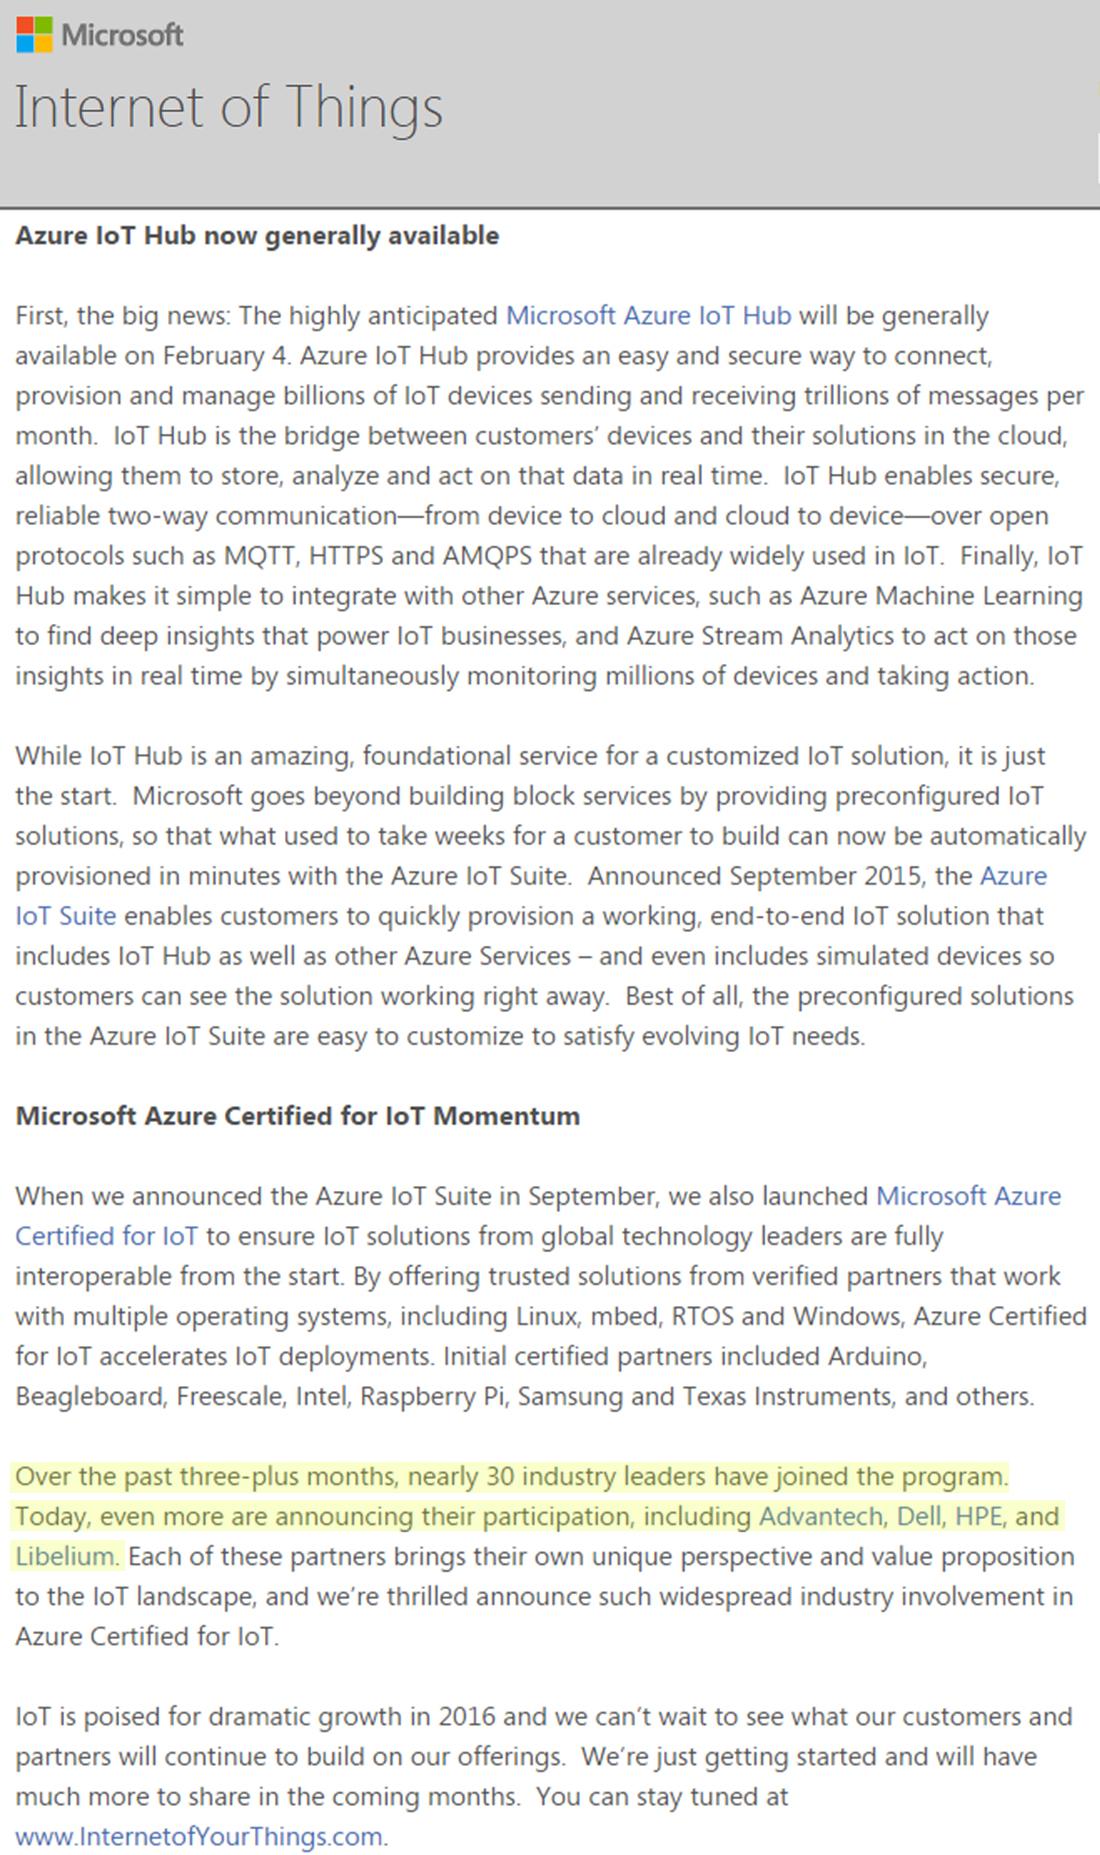 Libelium Microsoft Azure Certification